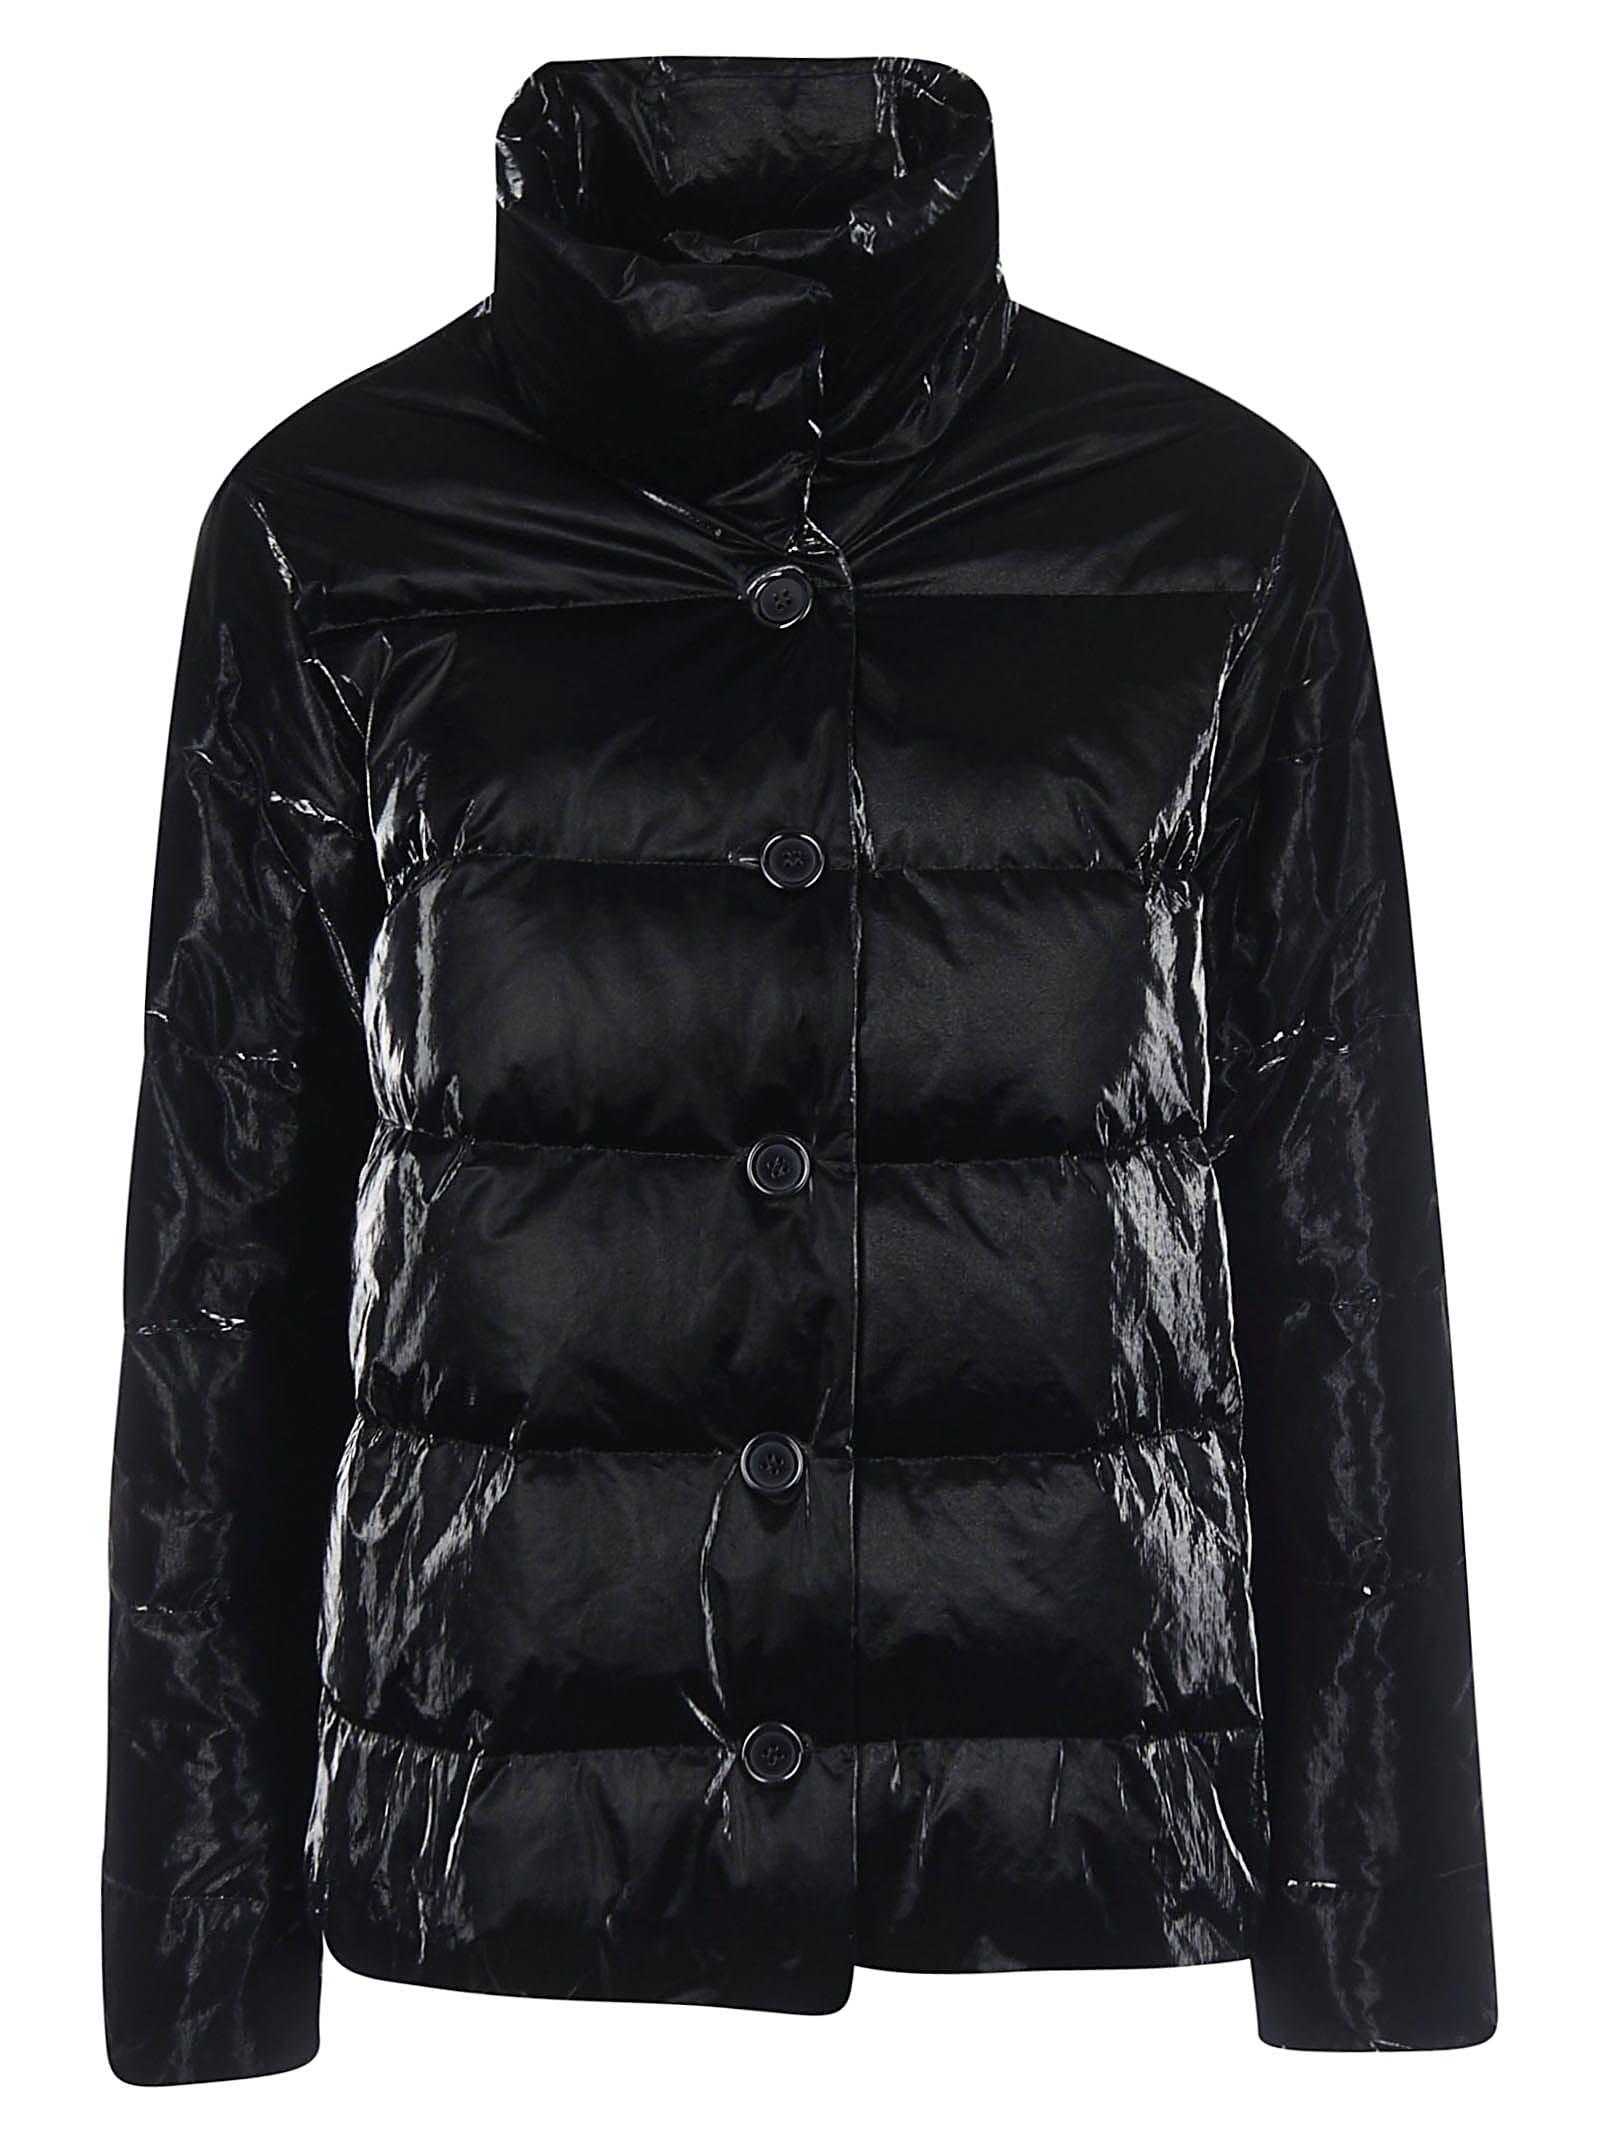 Aspesi Glossy Buttoned Padded Jacket